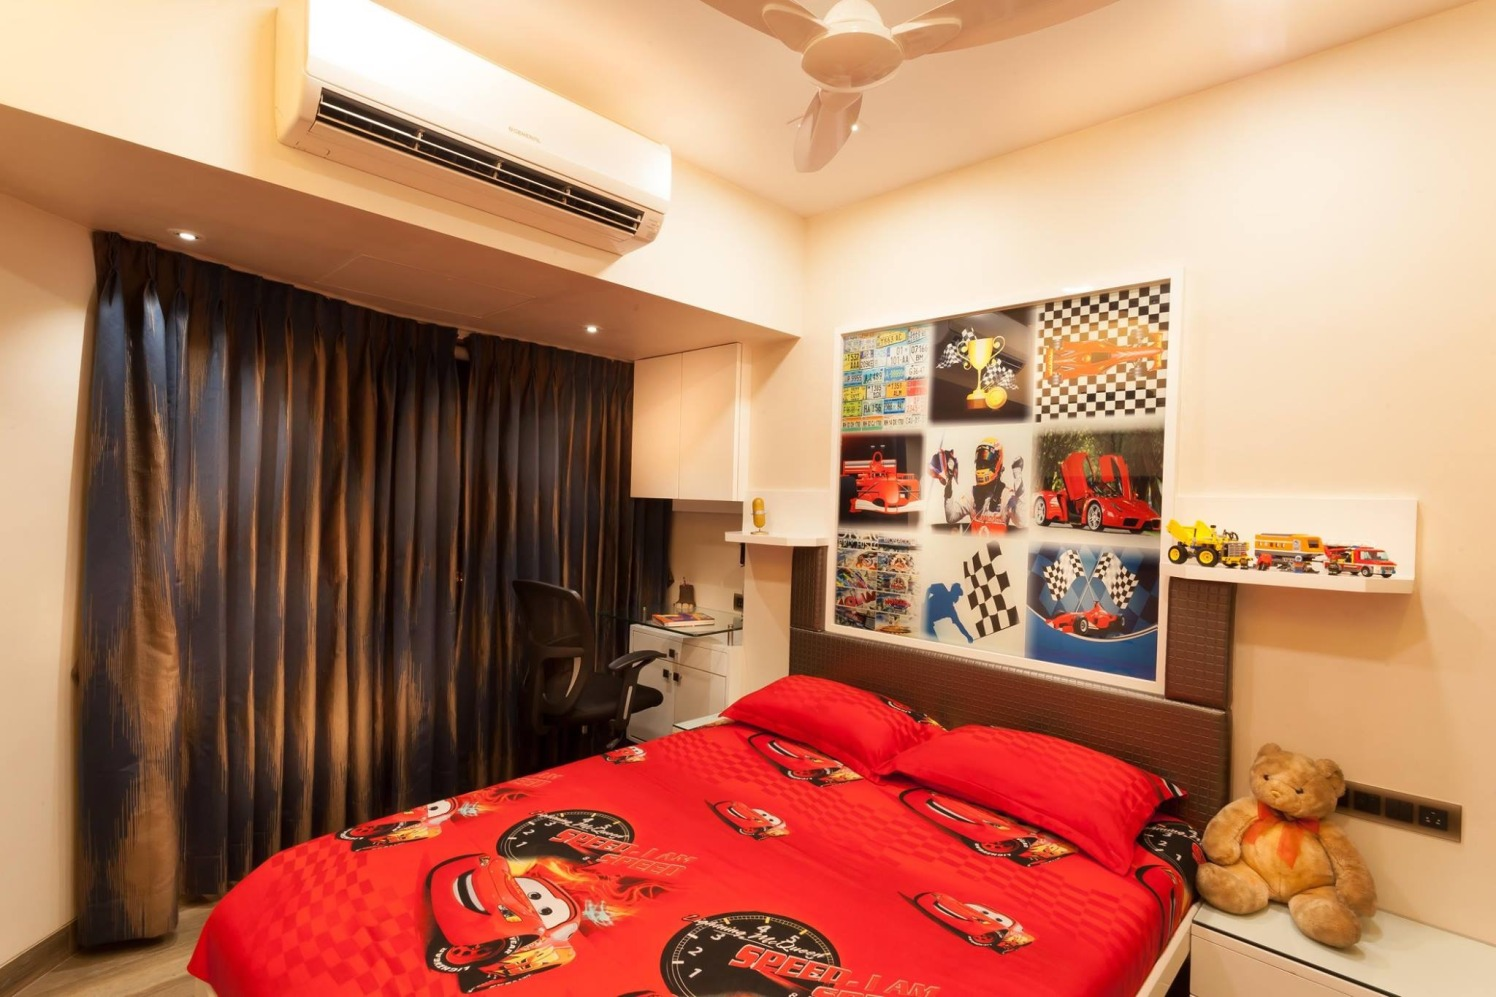 Simple yet trendy kids bedroom decor by Blue Arch Interiors Bedroom | Interior Design Photos & Ideas